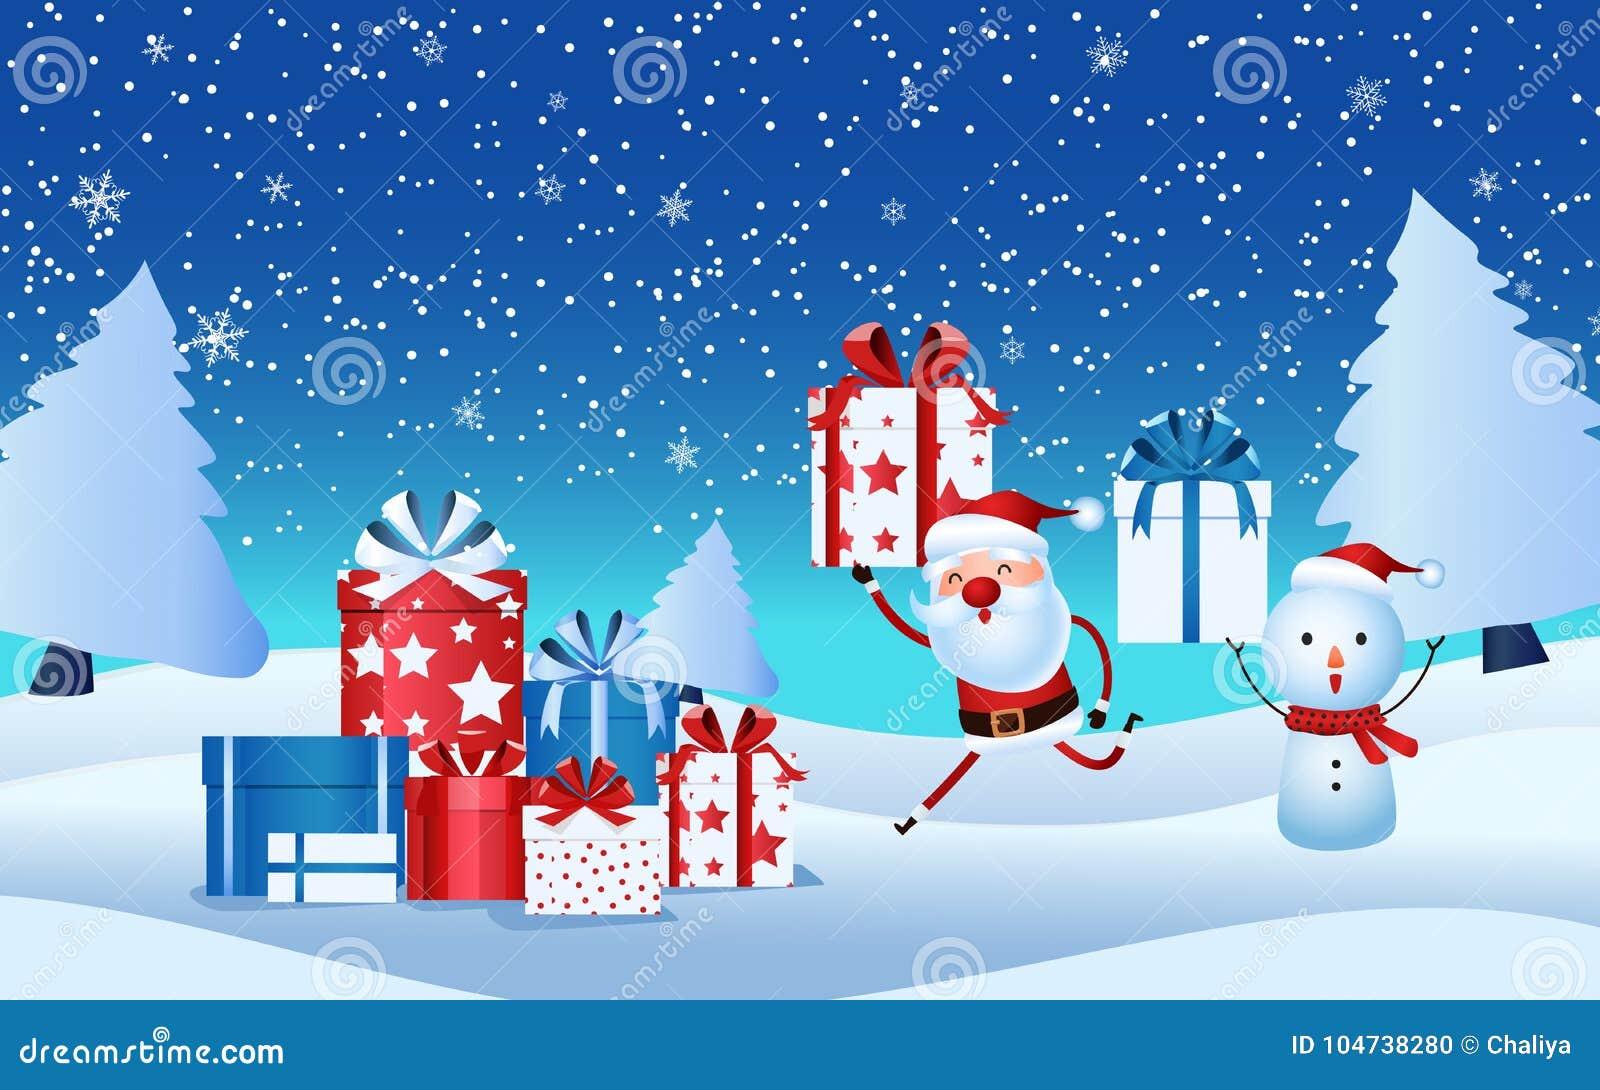 Cheerful Santa Claus Snowman Holding Gift Box Christmas